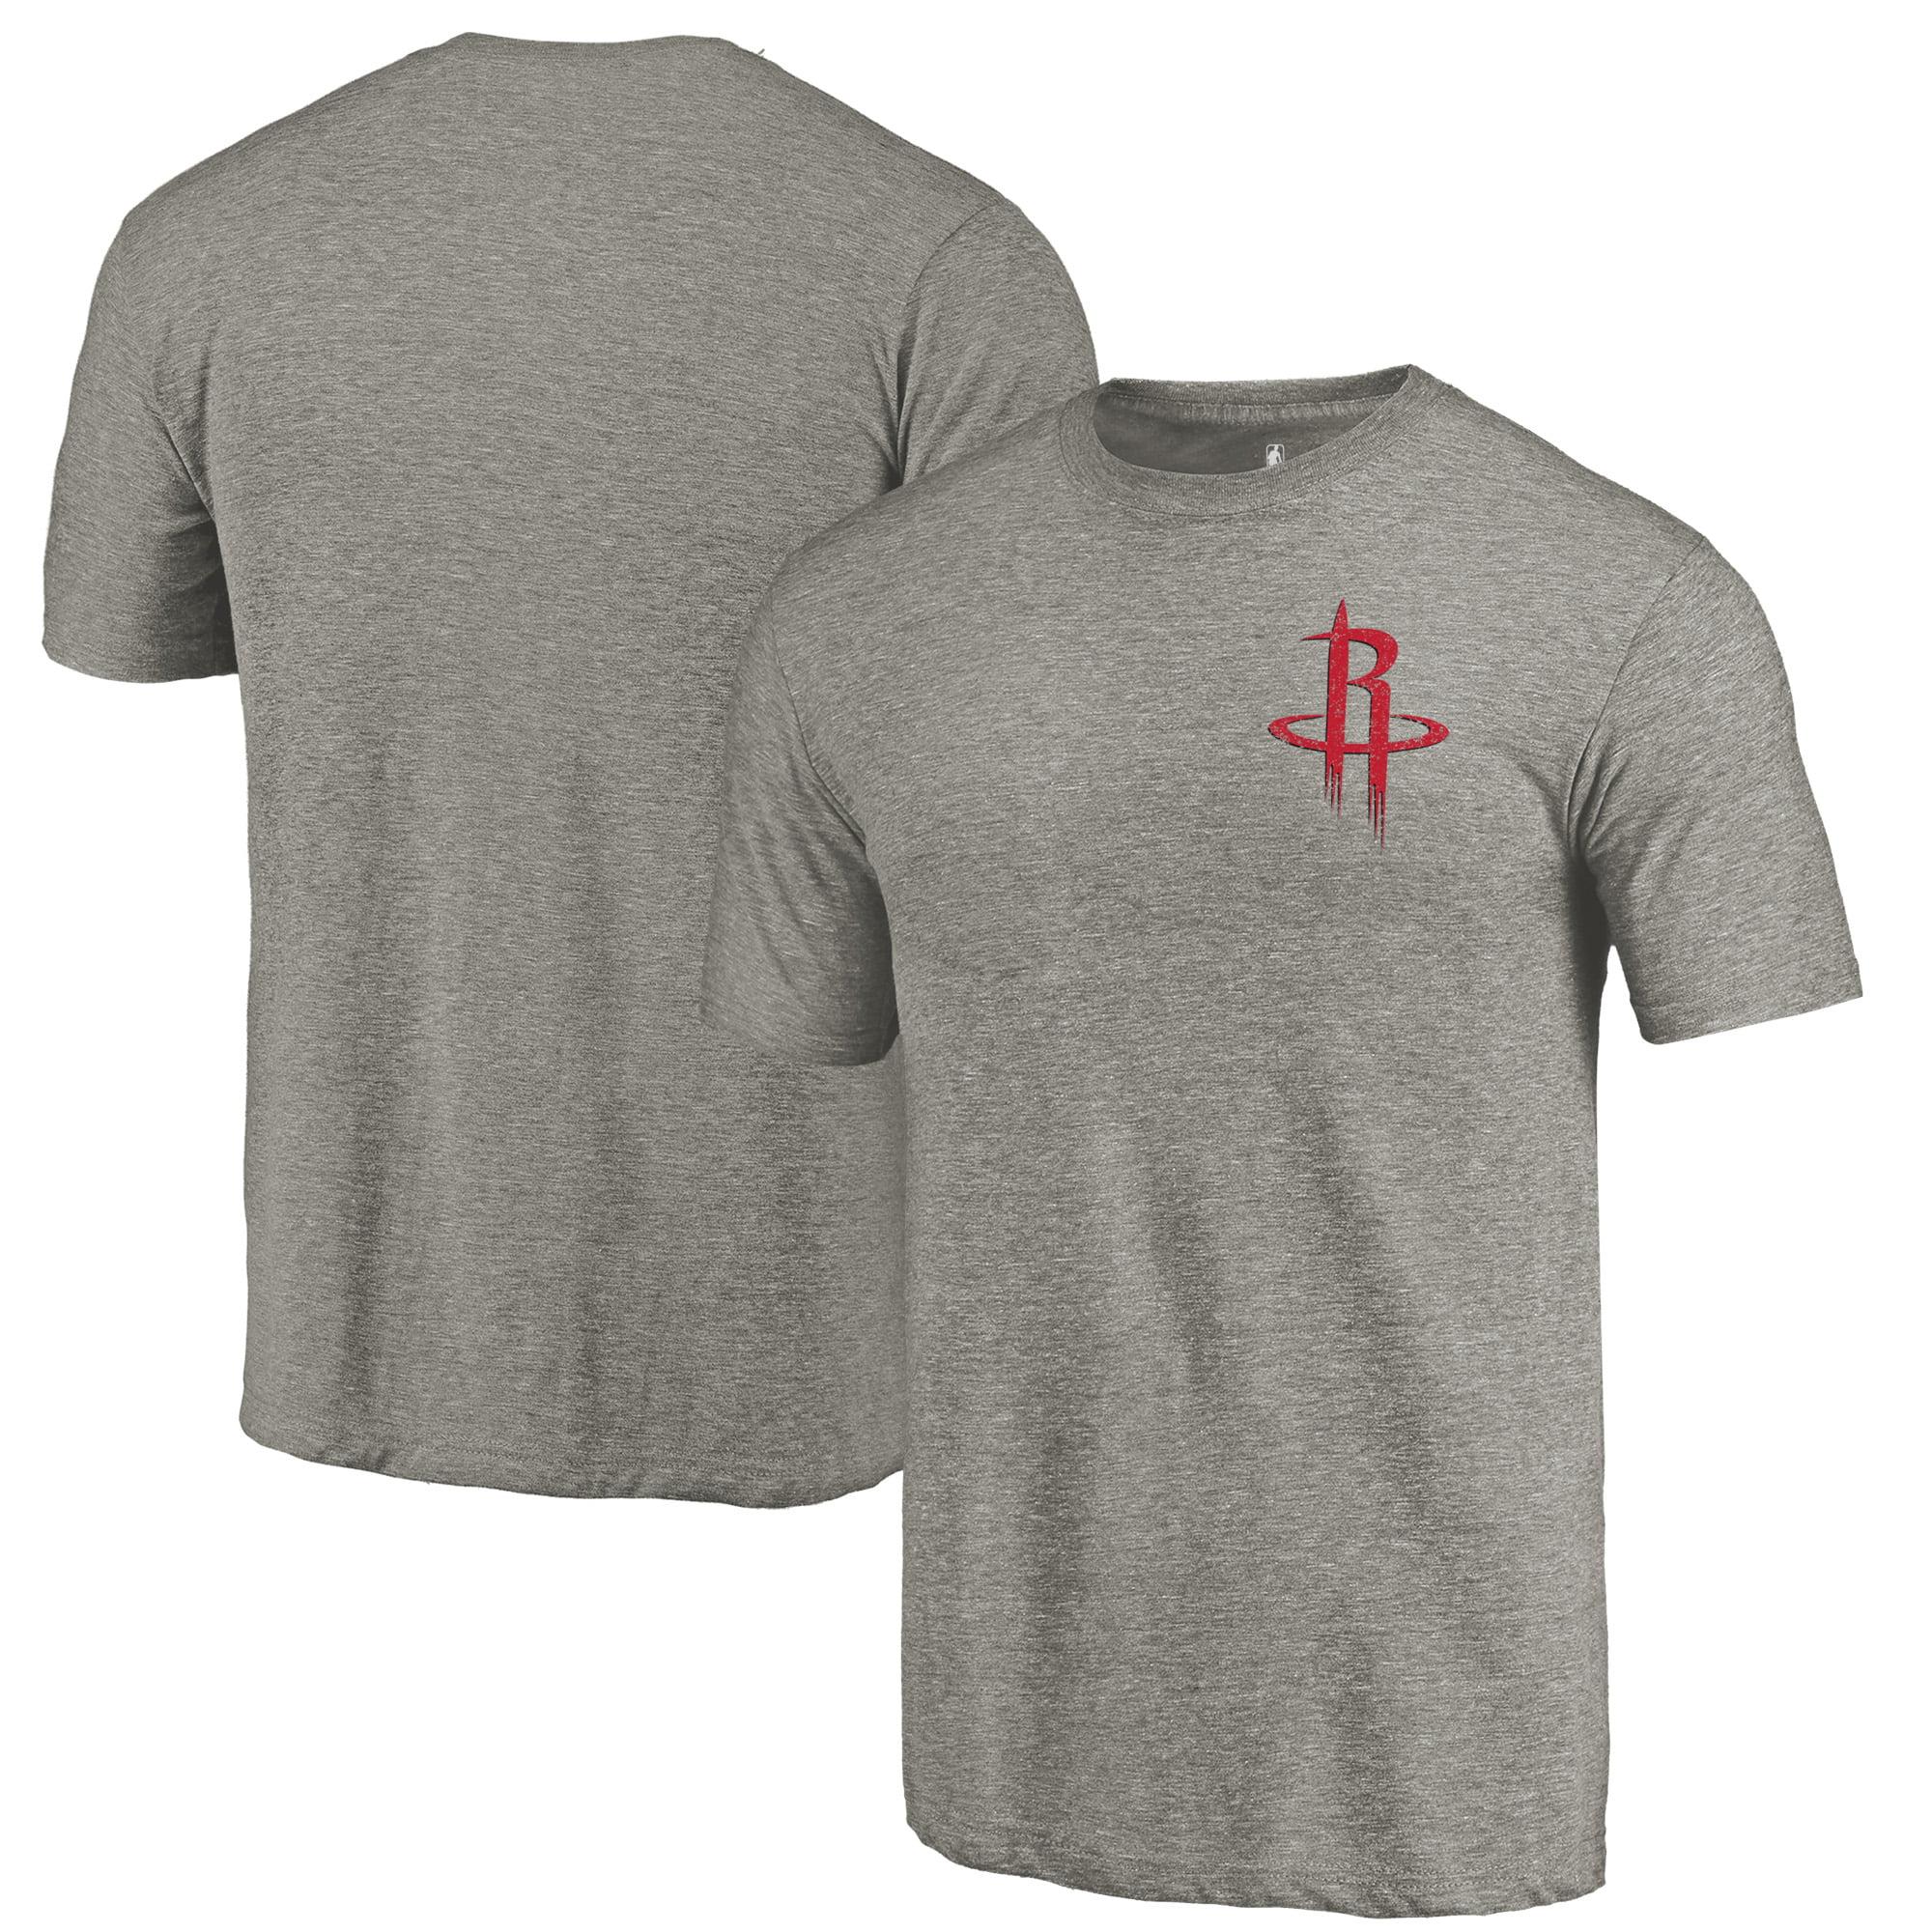 Houston Rockets Fanatics Branded Primary Logo Left Chest Distressed Tri-Blend T-Shirt - Gray